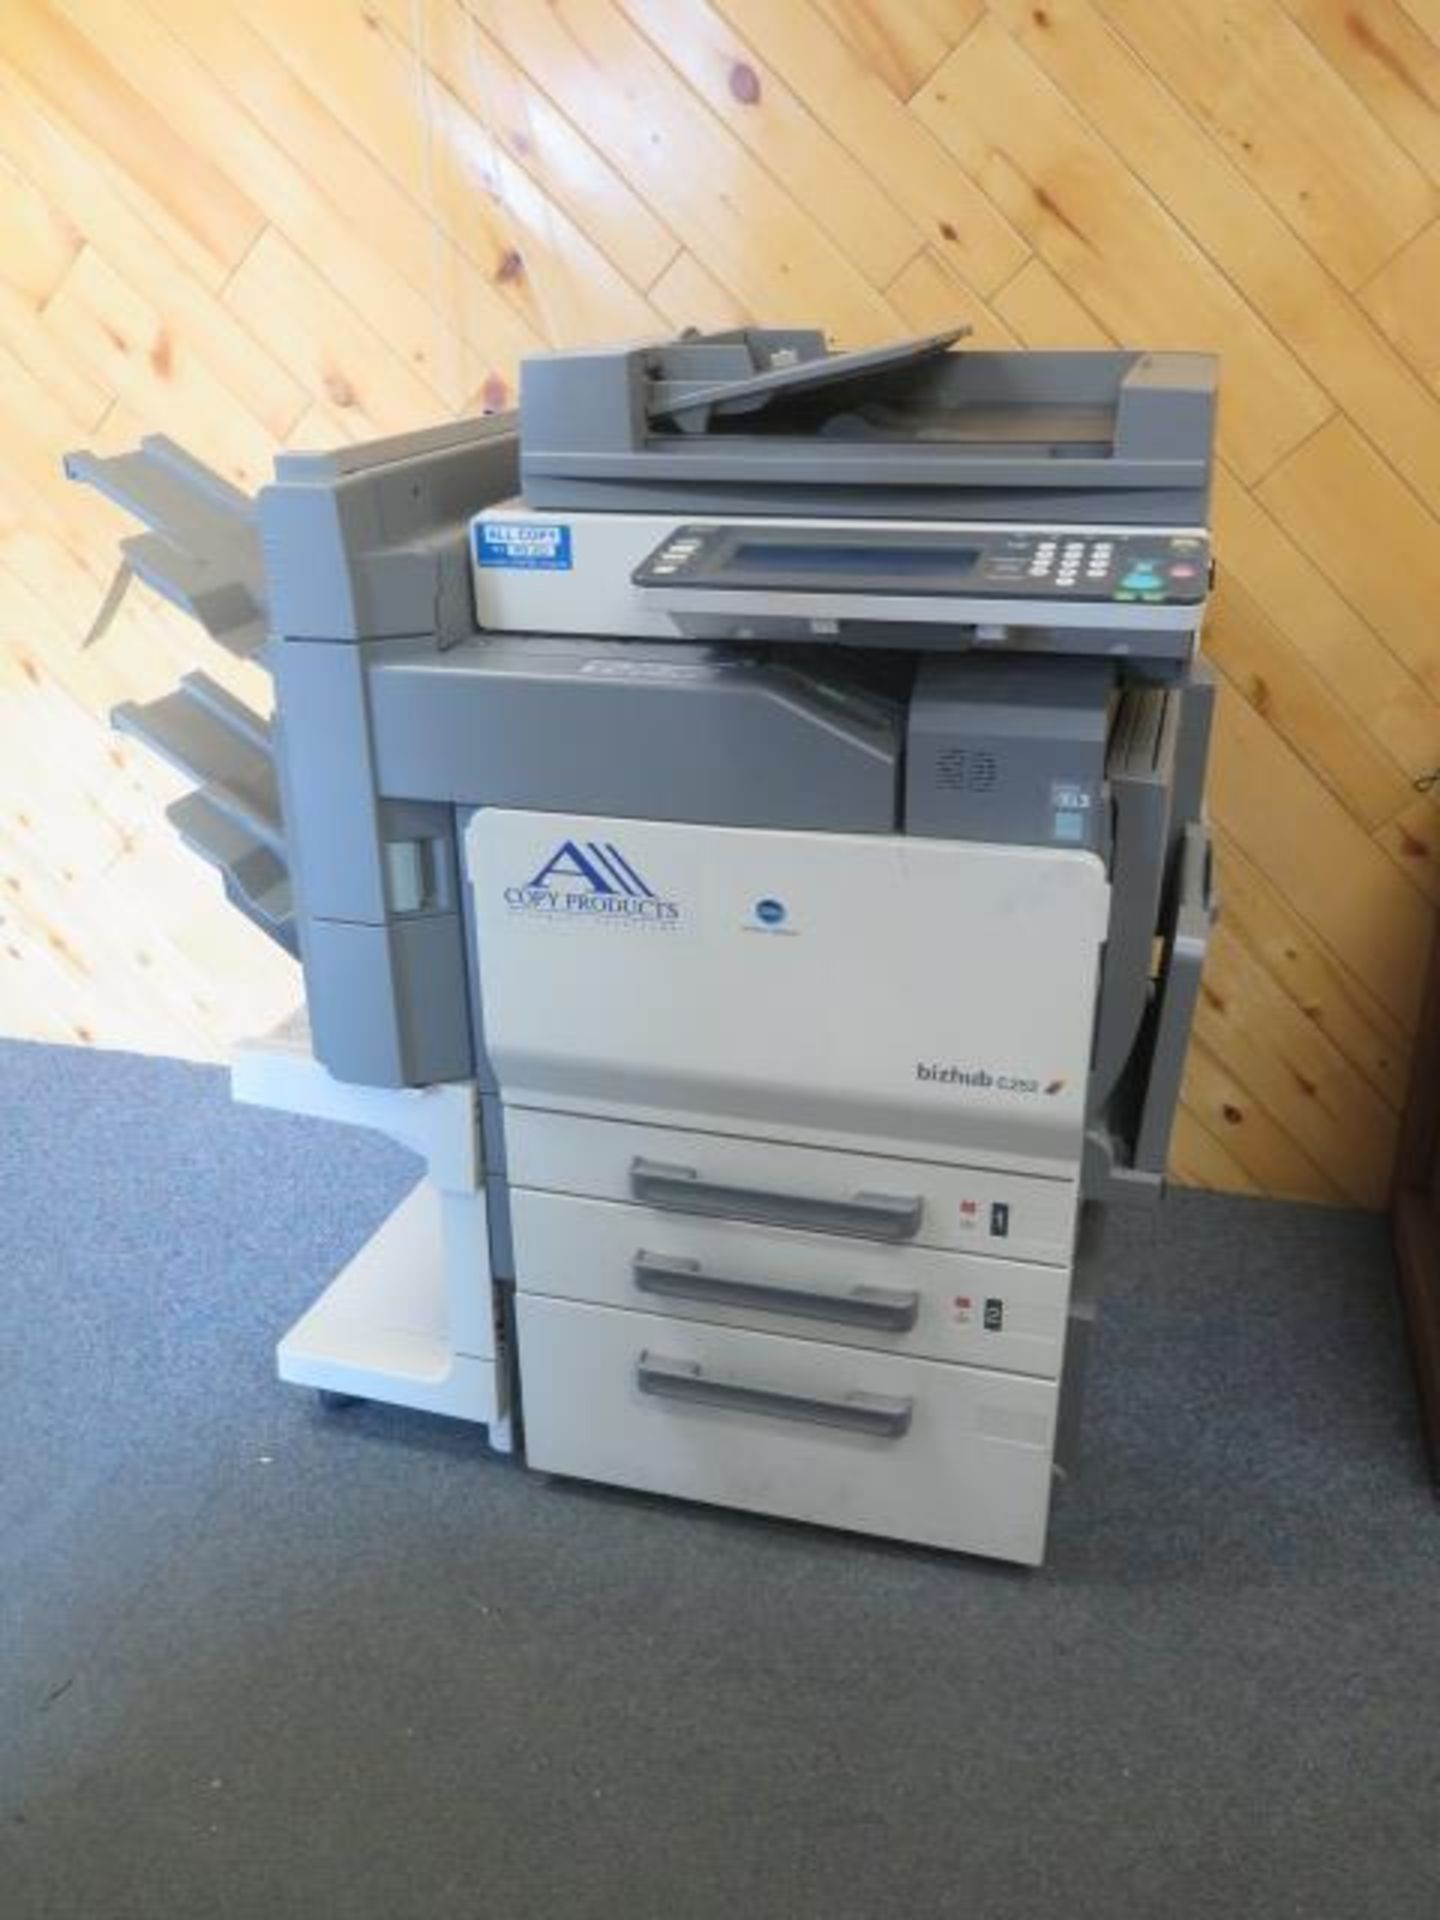 Konica Minolta bizhub C252 Color Copy Machine